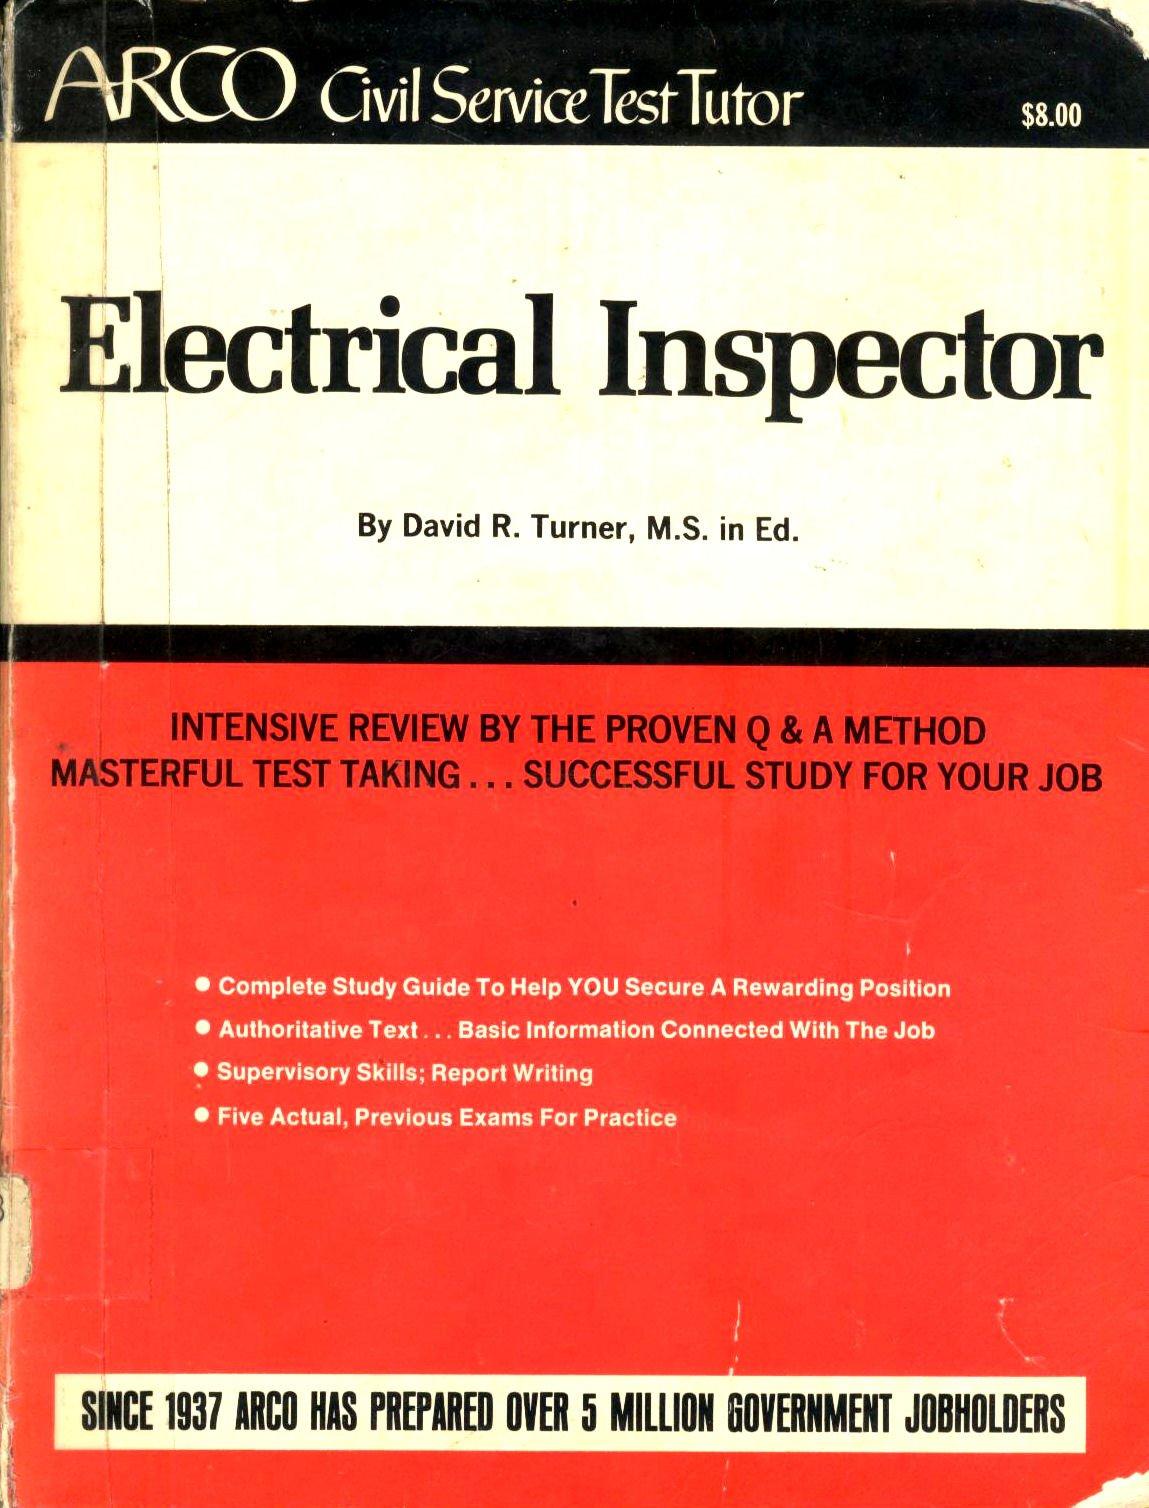 Electrical Inspecter (Arco civil service test tutor): CIVIL SERVICE:  9780668033503: Amazon.com: Books